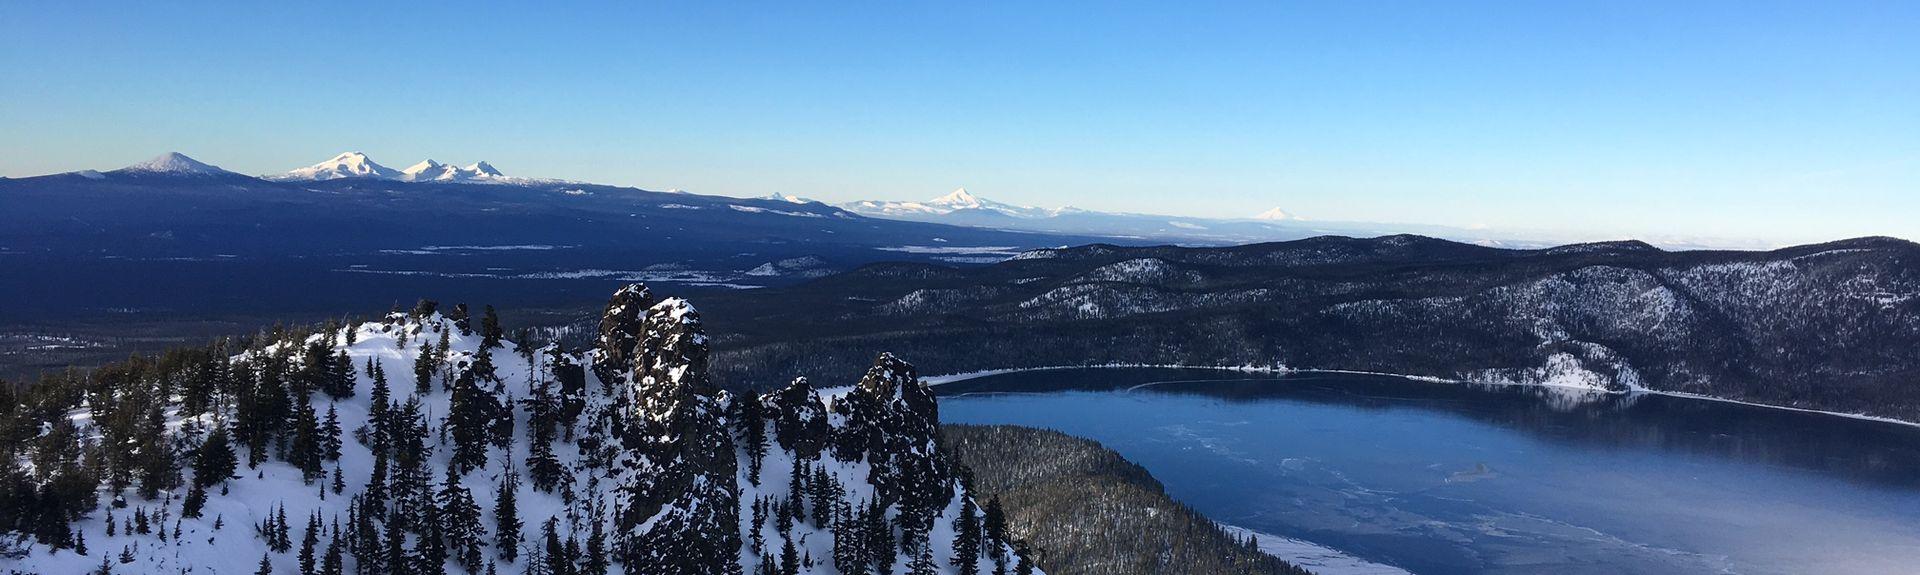 South Twin Lake, La Pine, Oregon, United States of America